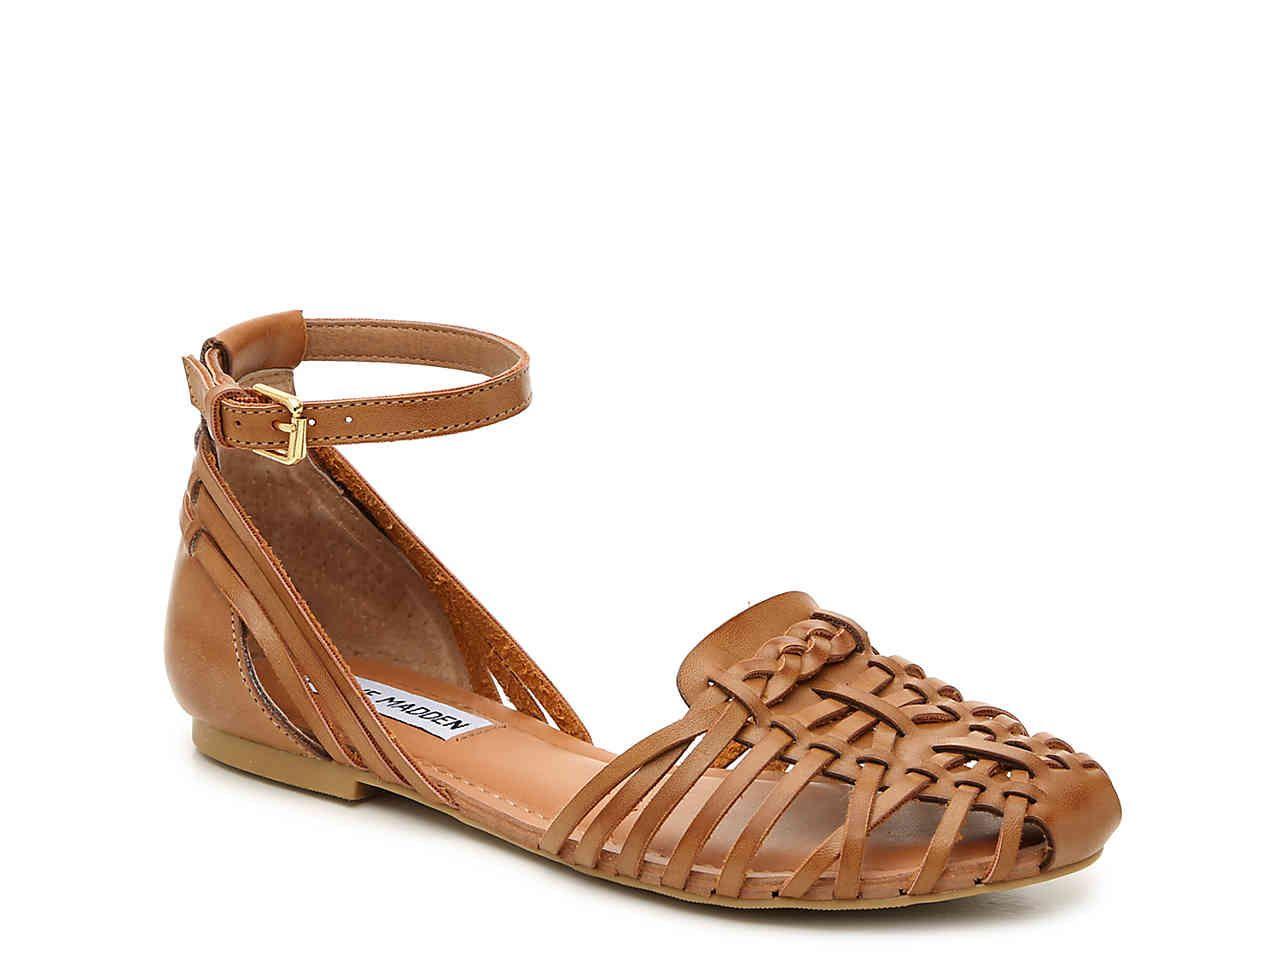 Steve Madden Mory Flat | Comfort shoes